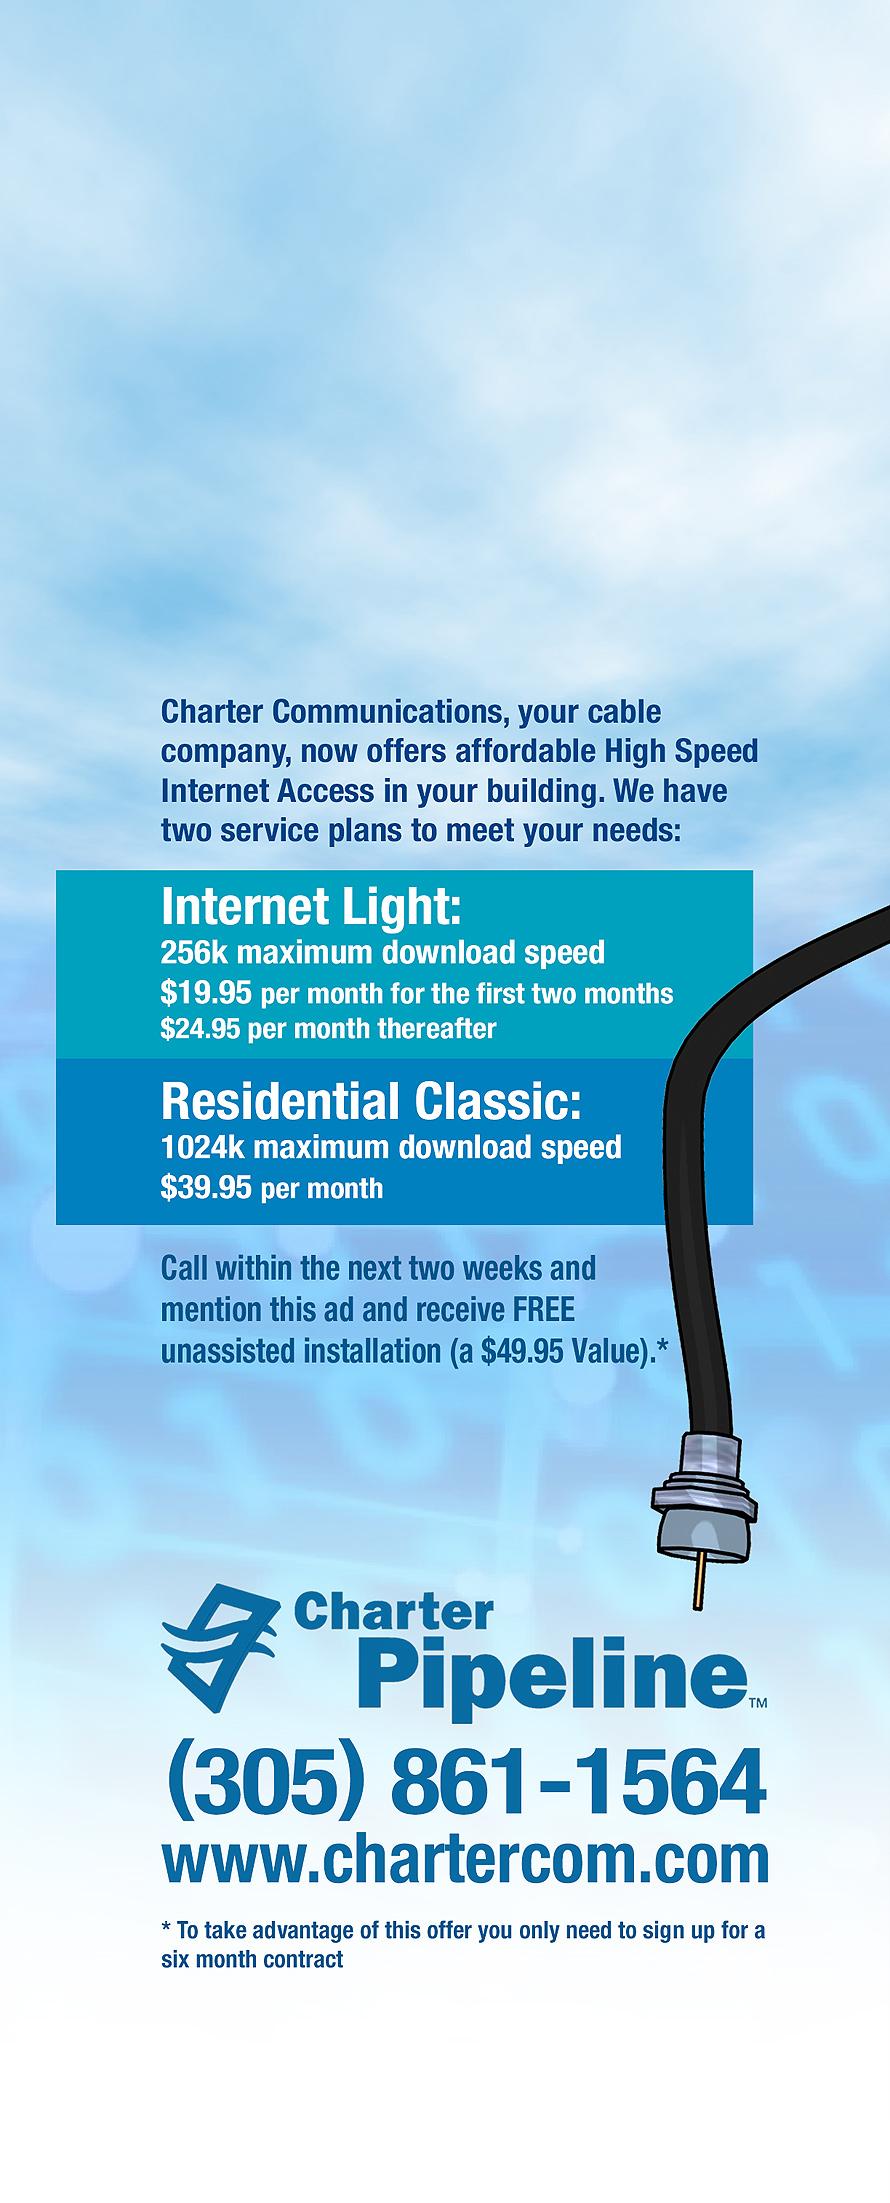 Charter Pipeline High Speed Internet